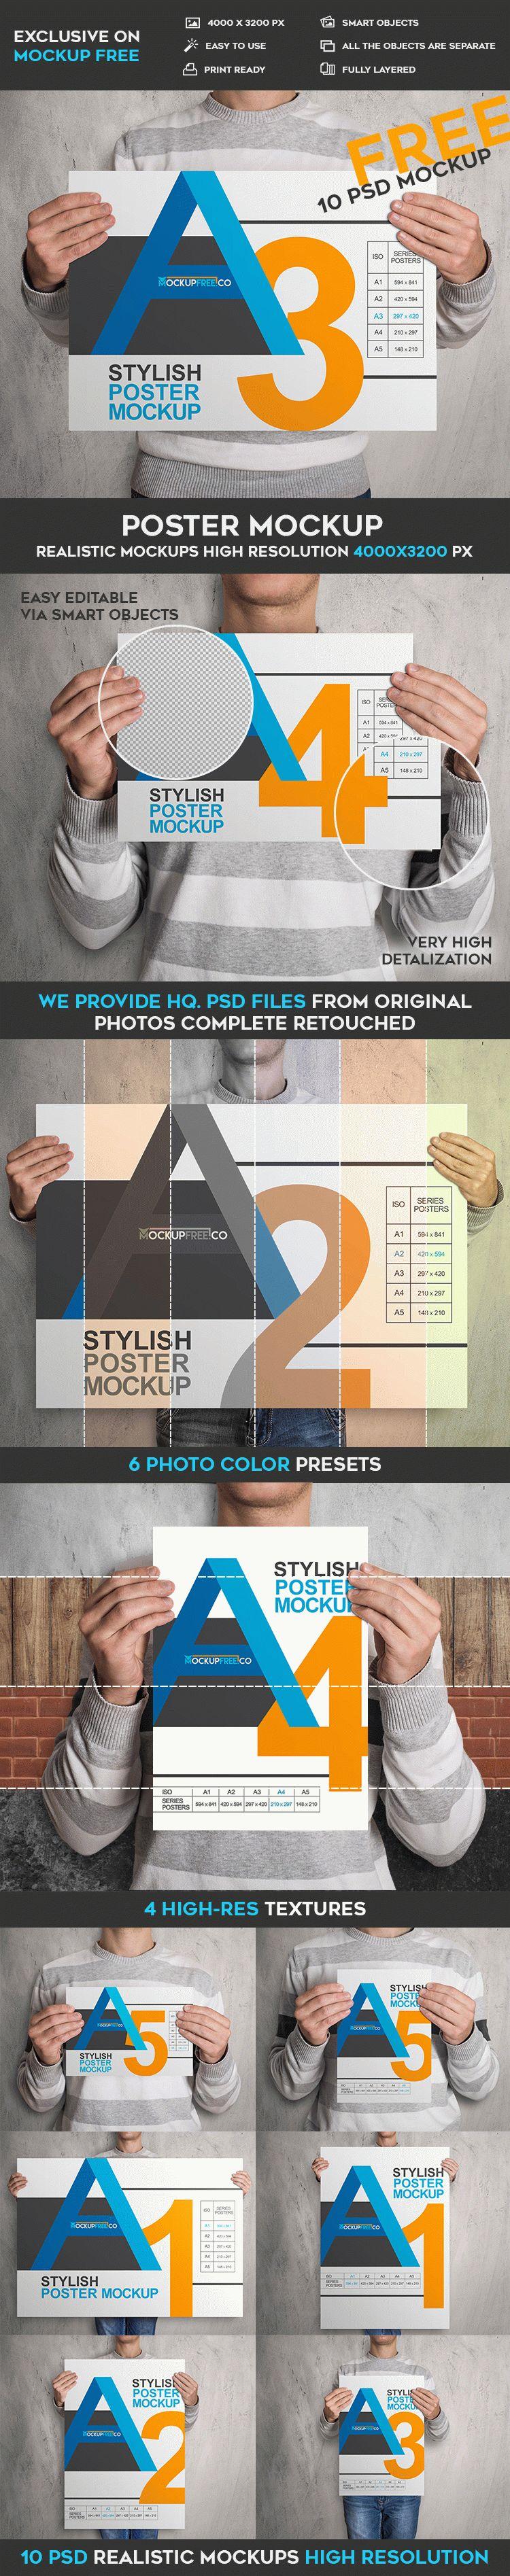 10 Free Poster PSD Mockups | Free PSD Templates | #free #photoshop ...